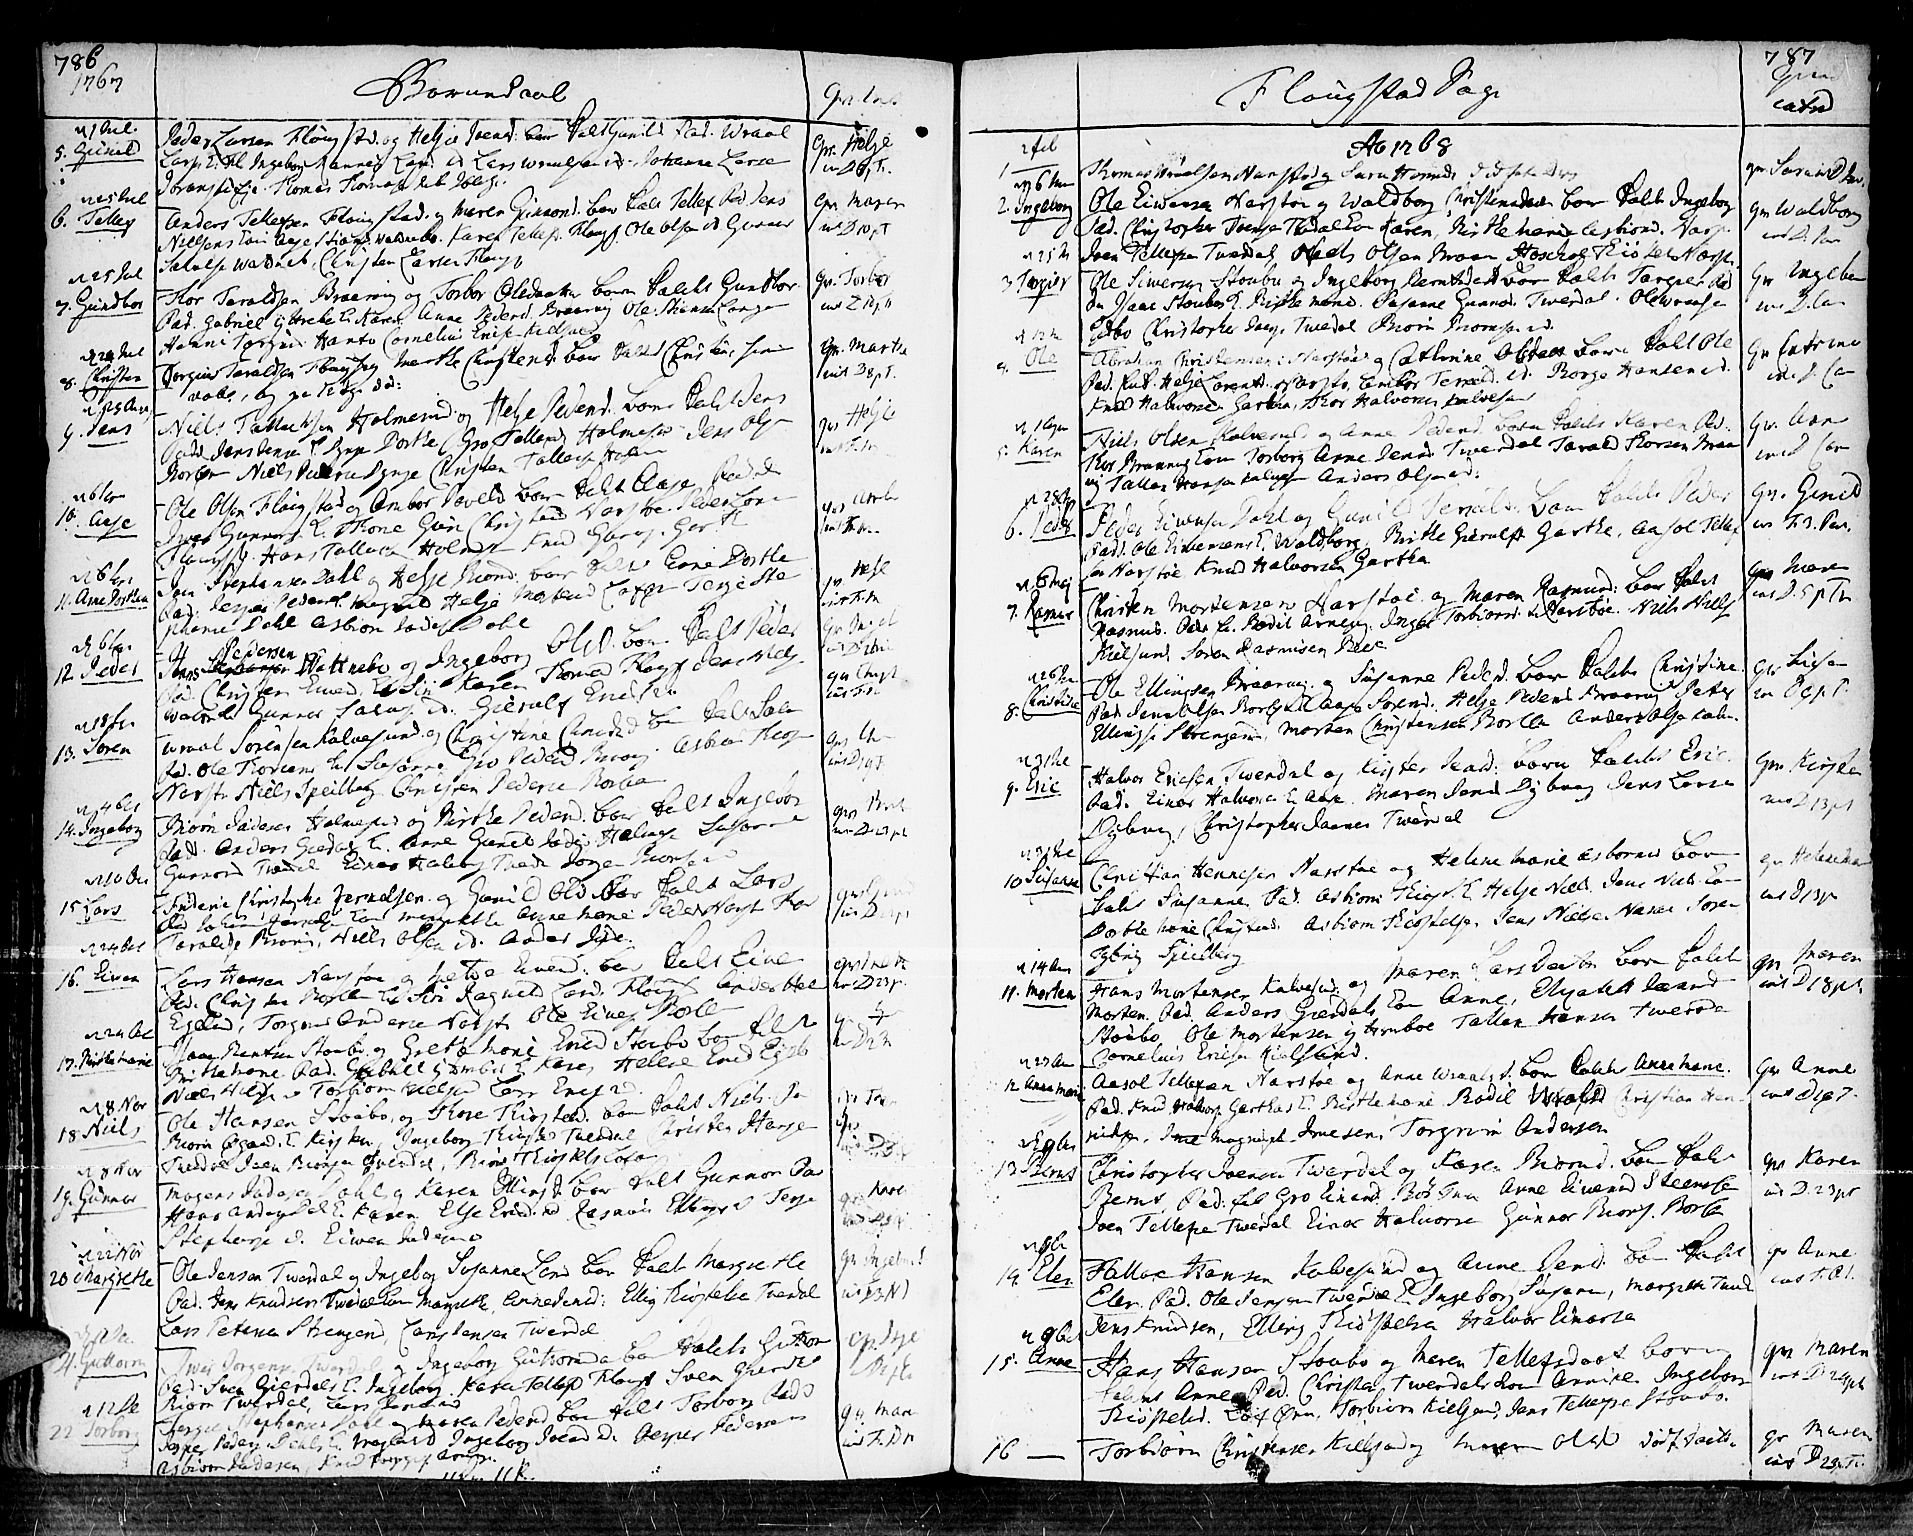 SAK, Dypvåg sokneprestkontor, F/Fa/Faa/L0001: Ministerialbok nr. A 1 /2, 1765-1798, s. 786-787